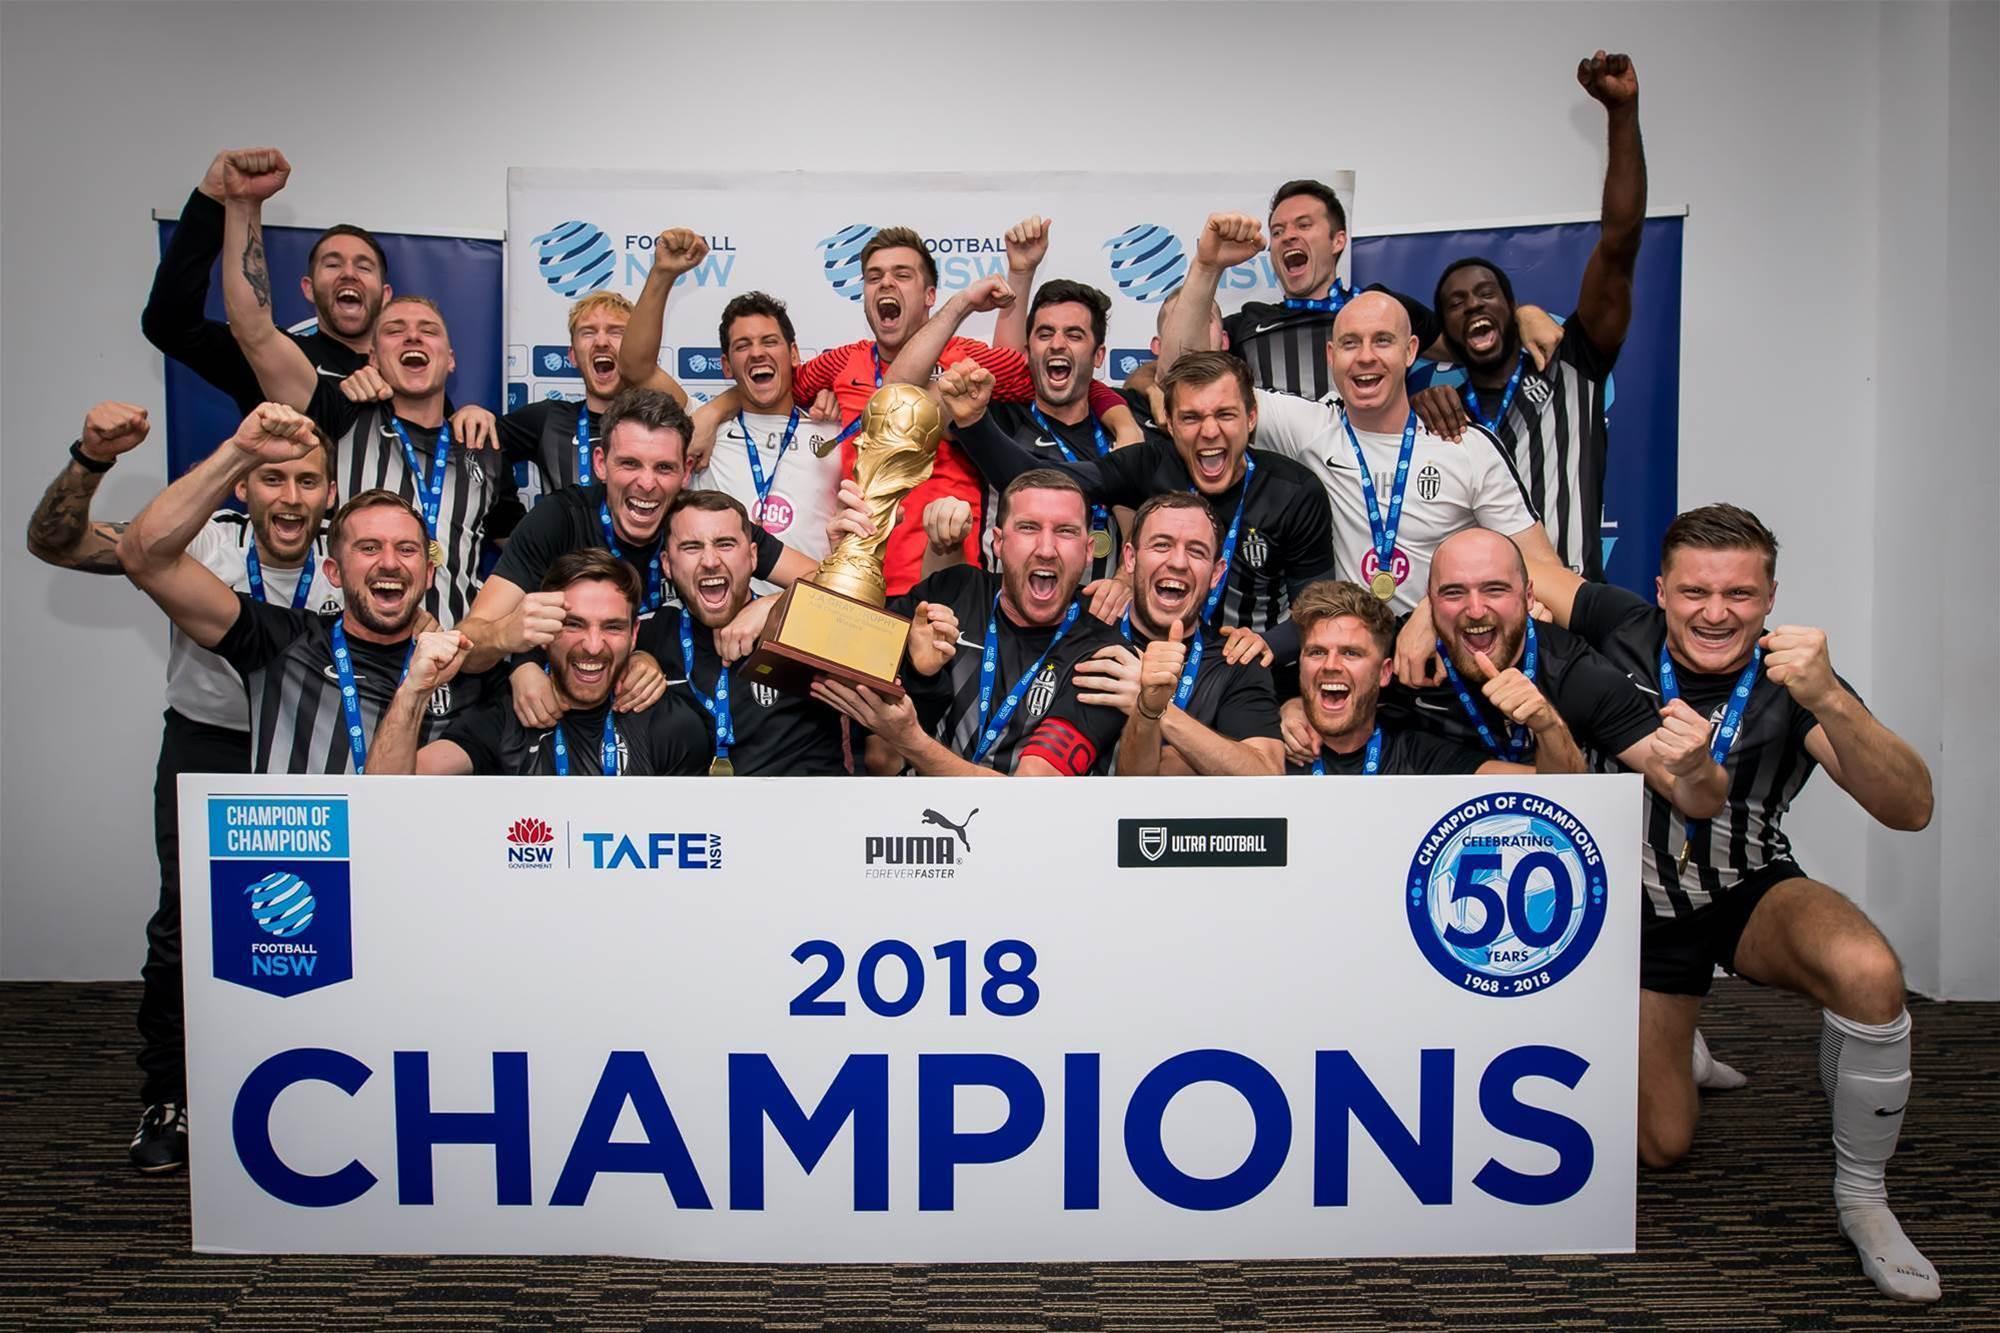 Champions of Champions celebrates 50 years!